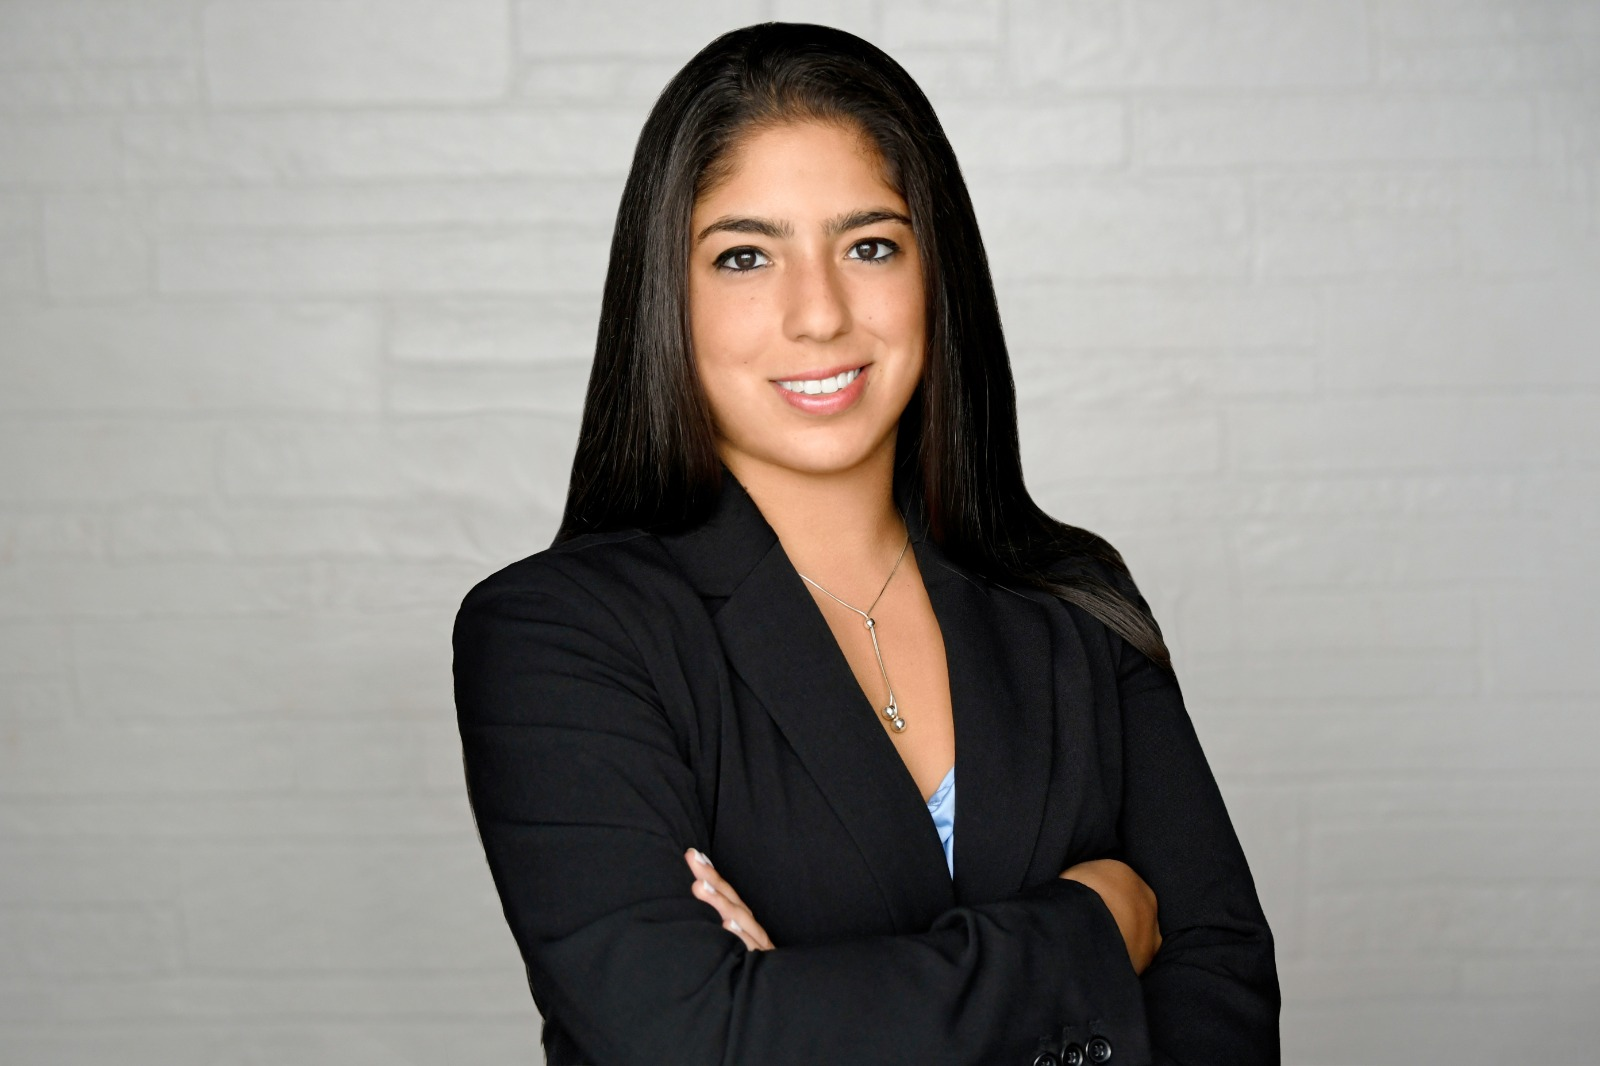 Yamile Dominguez